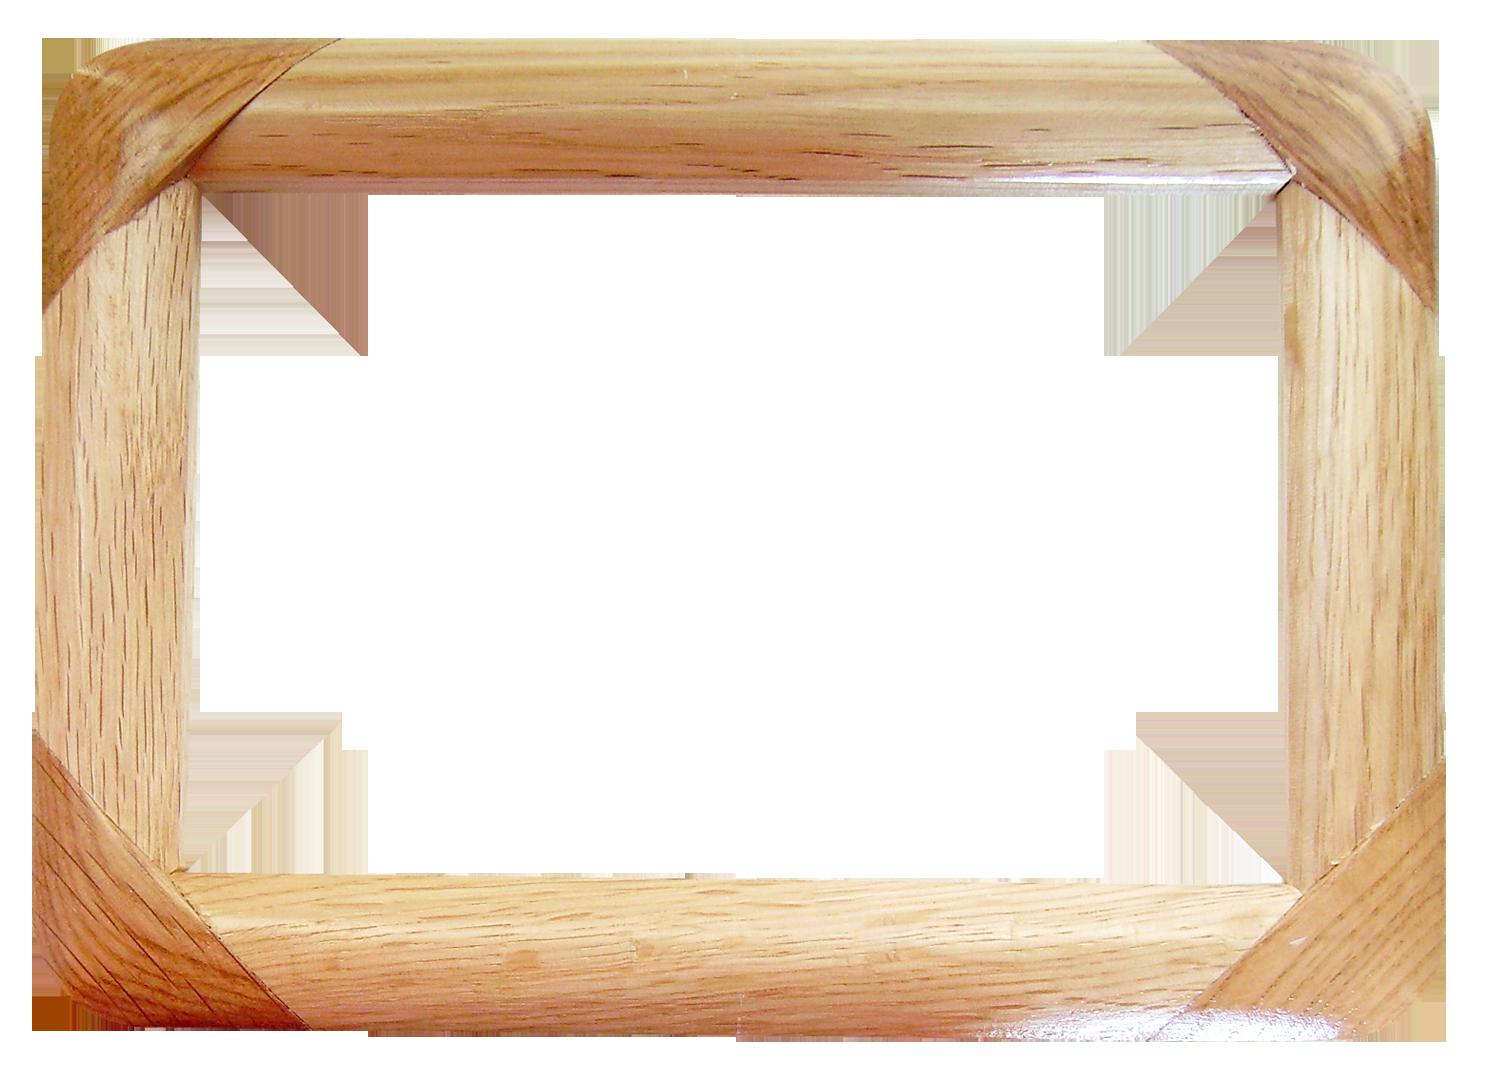 Frame png transparent. Photo image pngpix